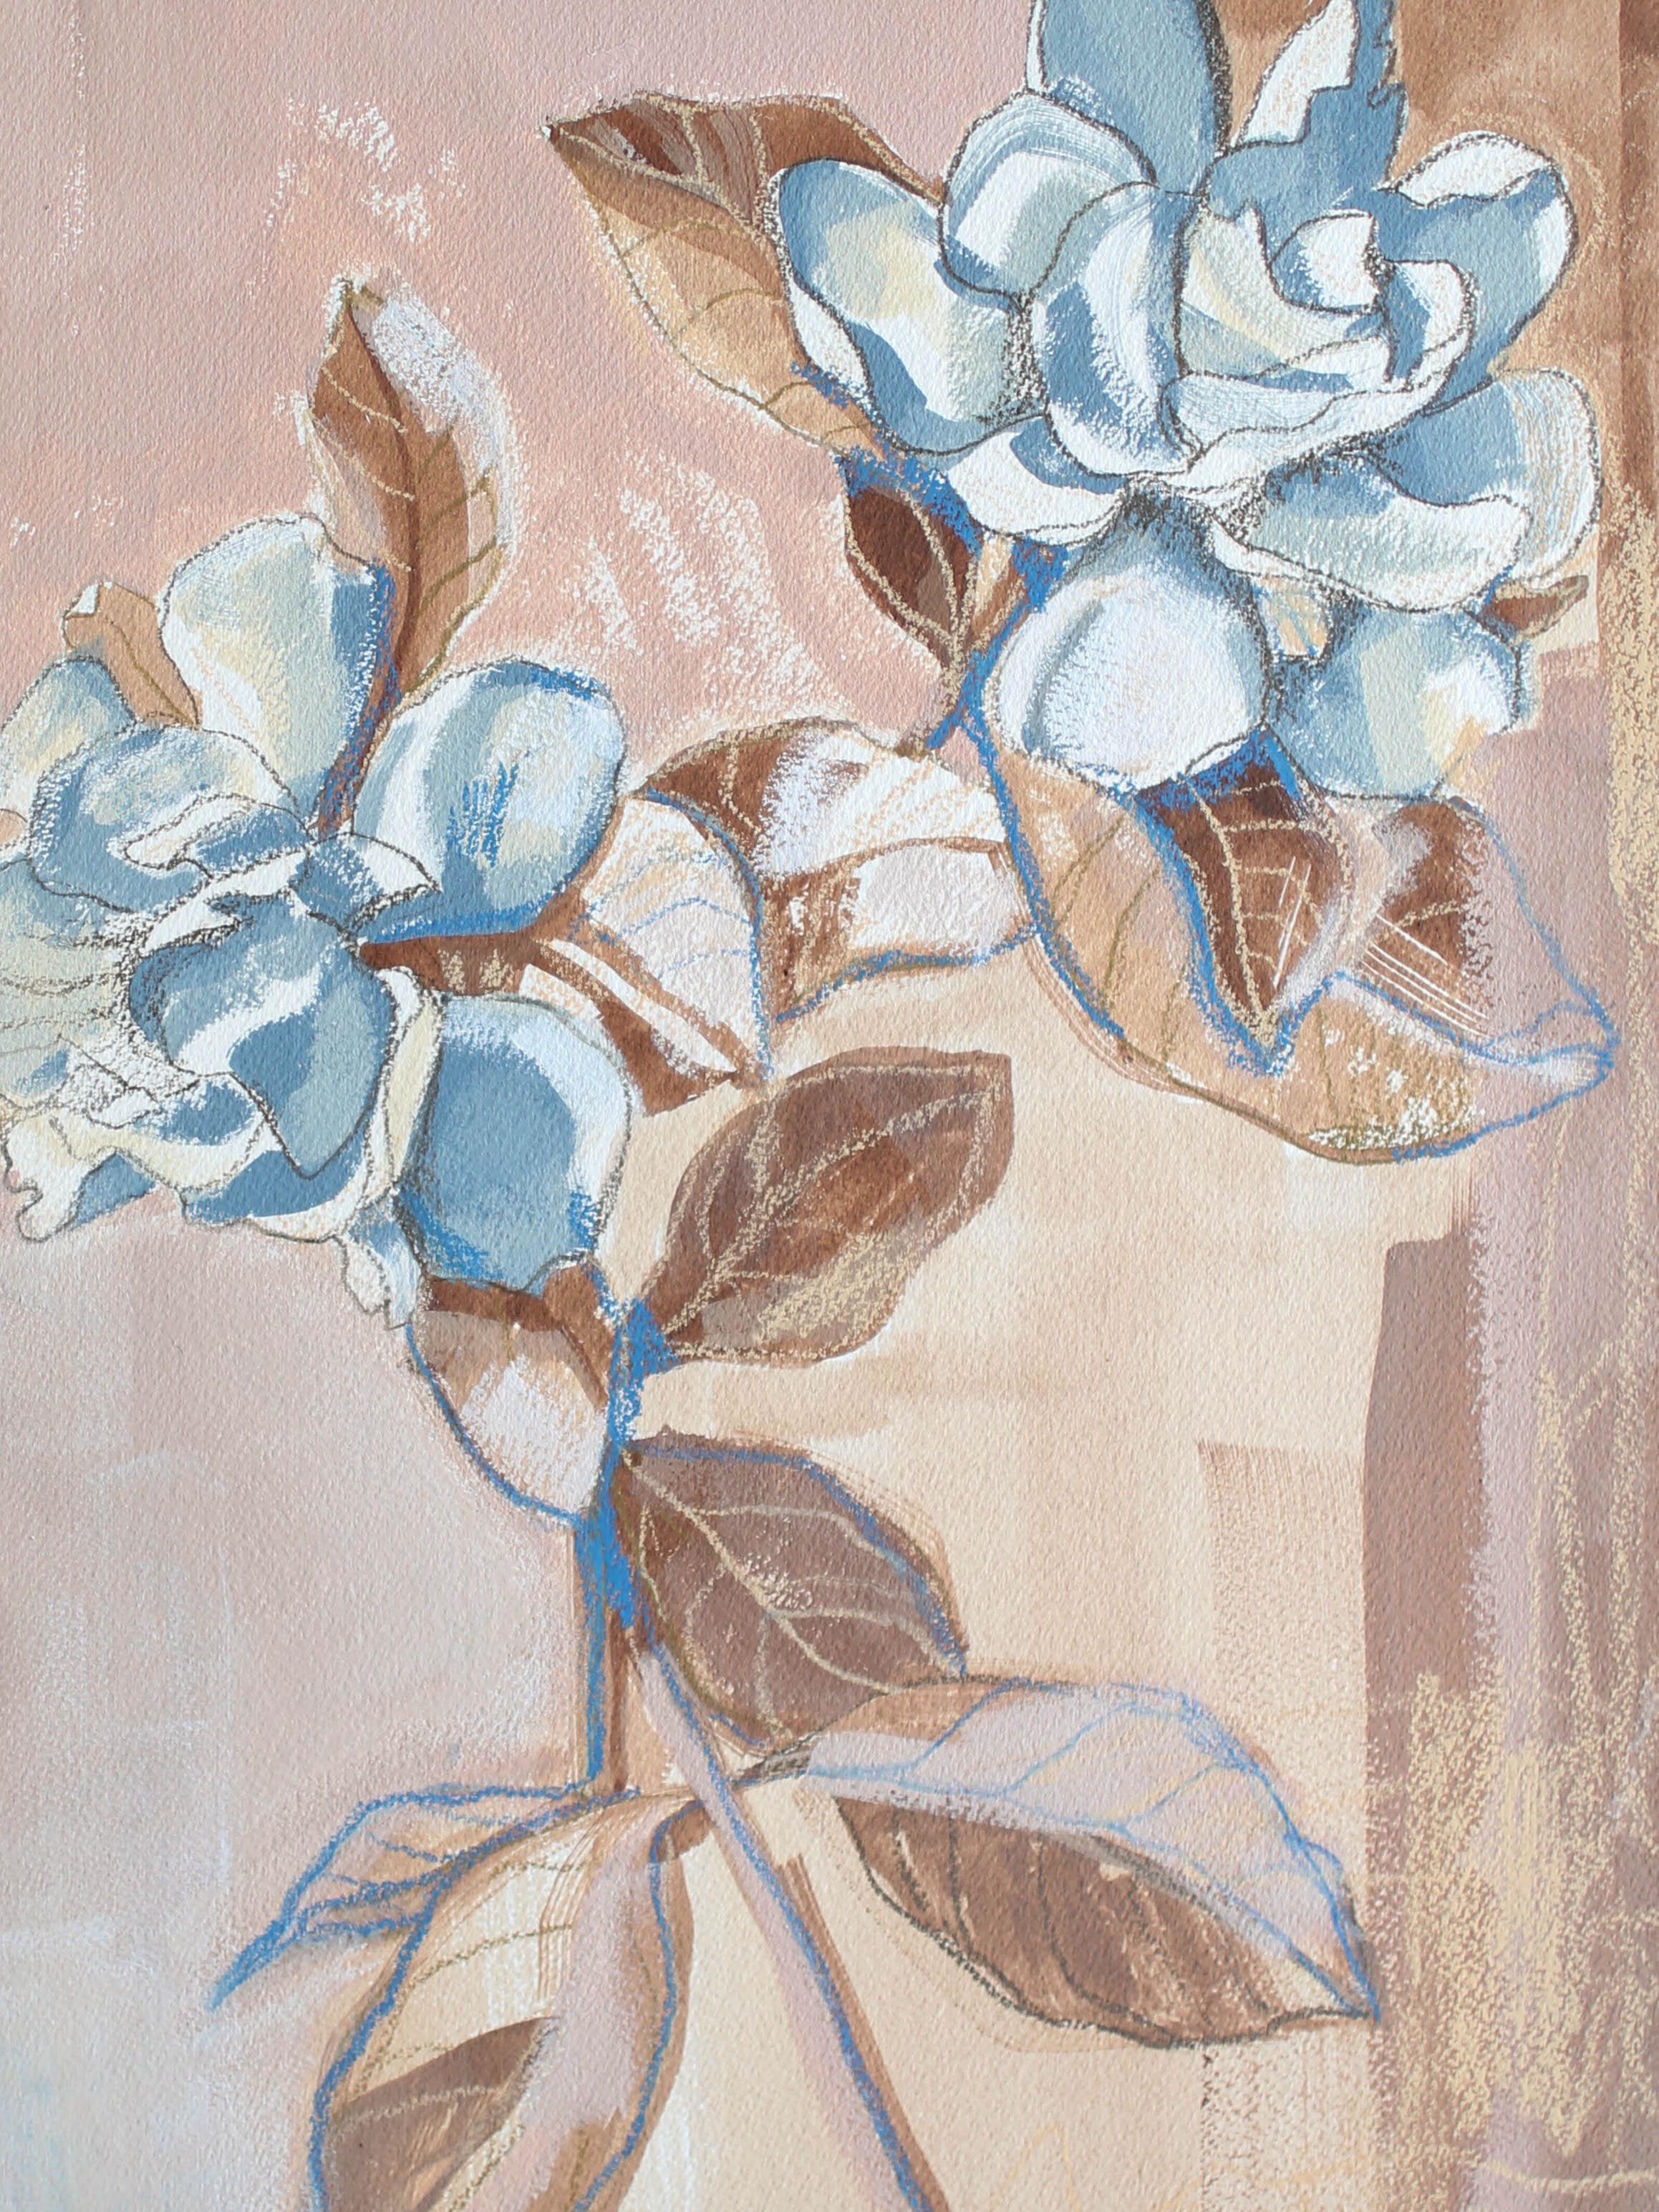 Gardenias for Caitln, 16x12 Katherine Corden Art